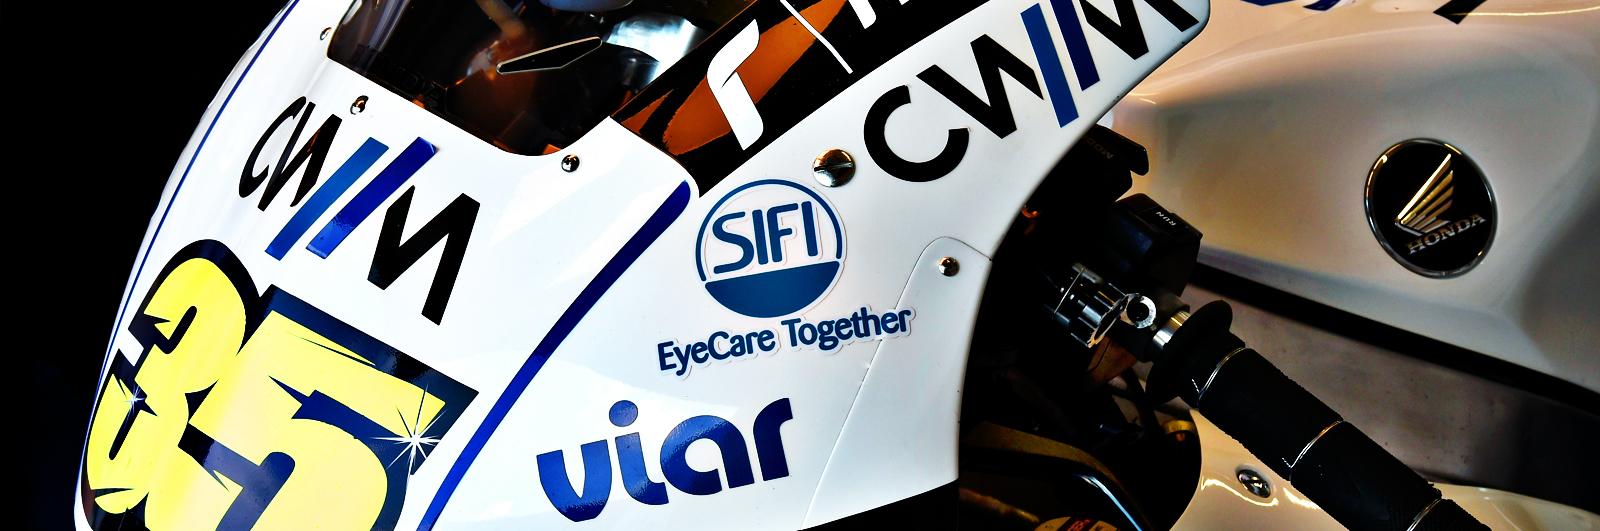 header sponsorship motoGP